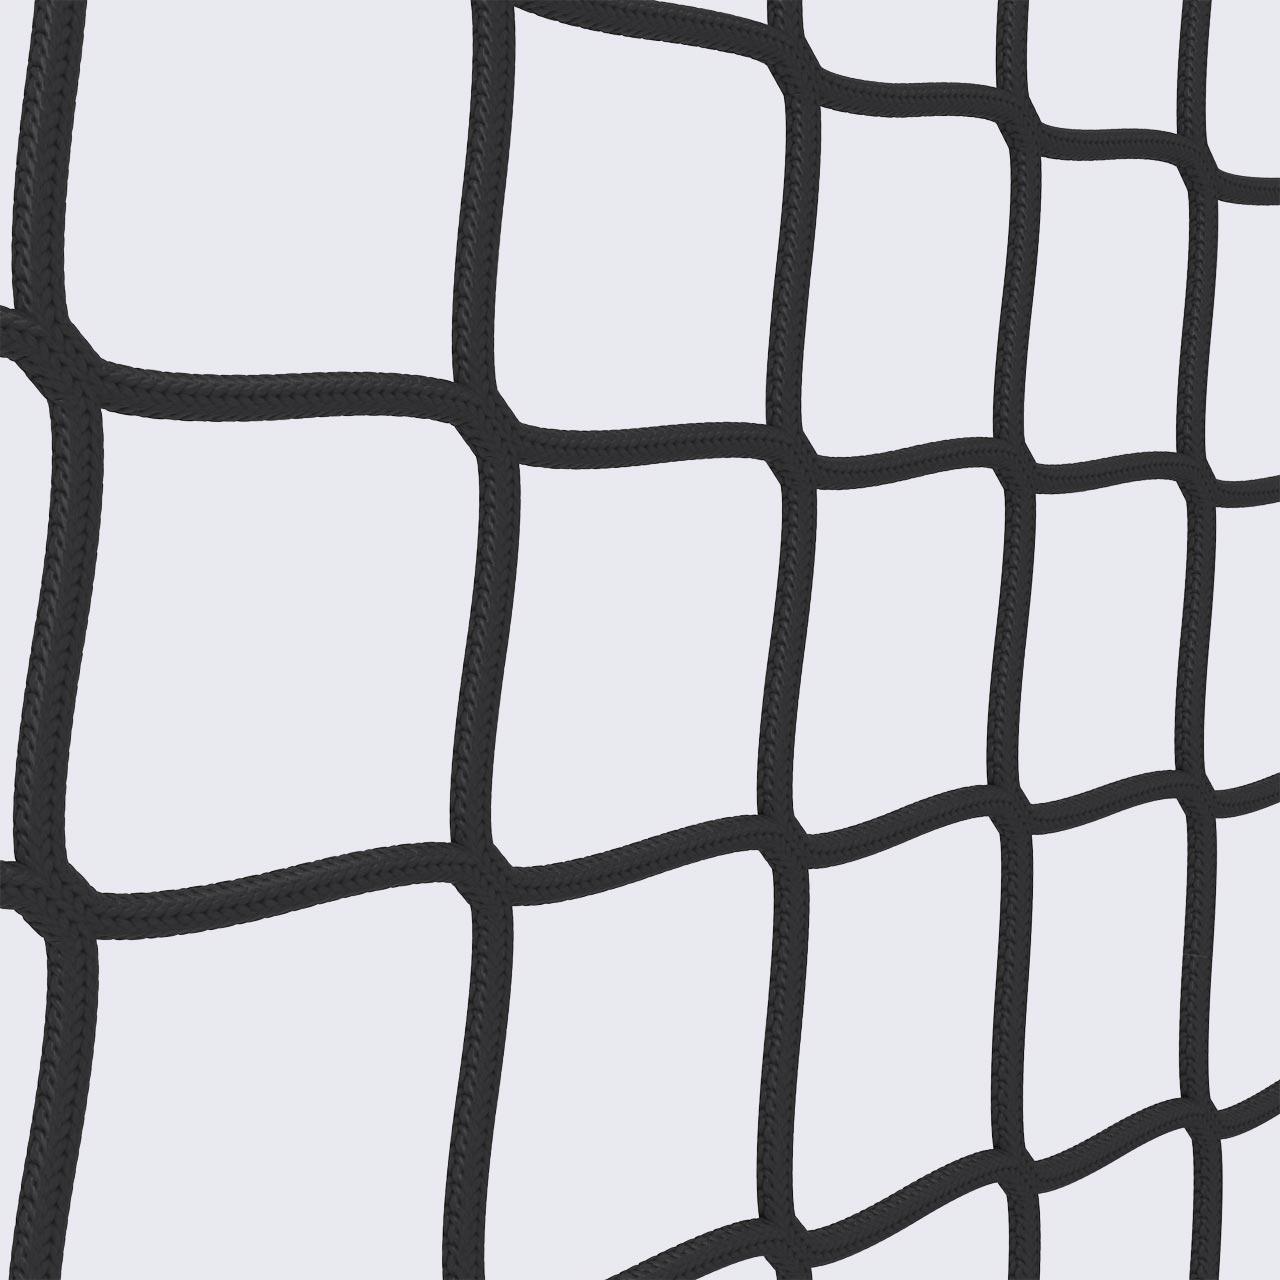 Ballfangnetz Für Golf Als Maßanfertigung